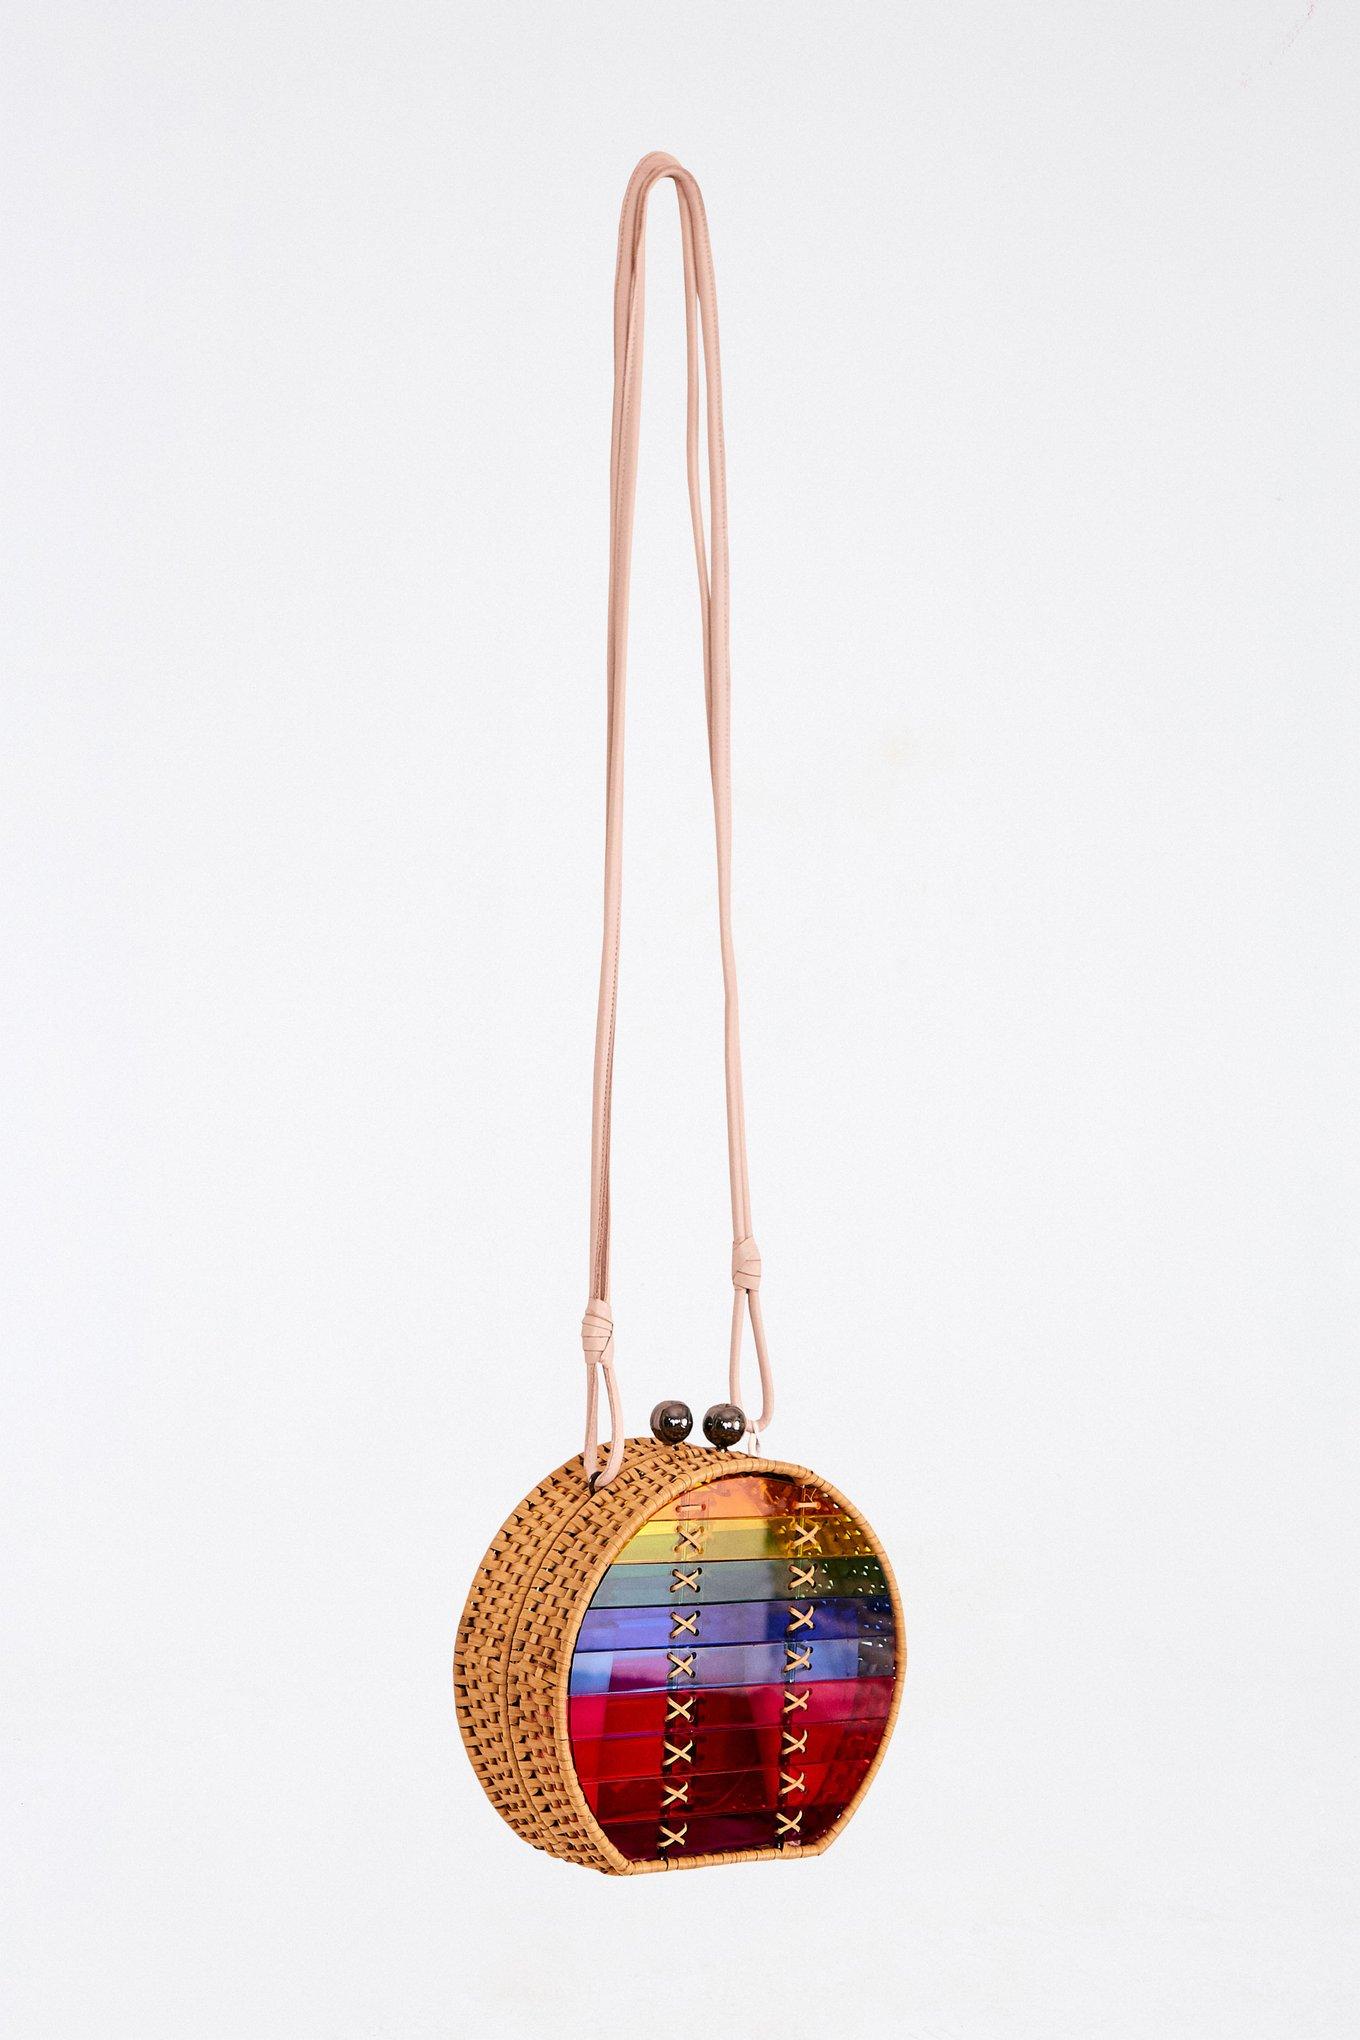 Rainbow Waiwai Bag $624